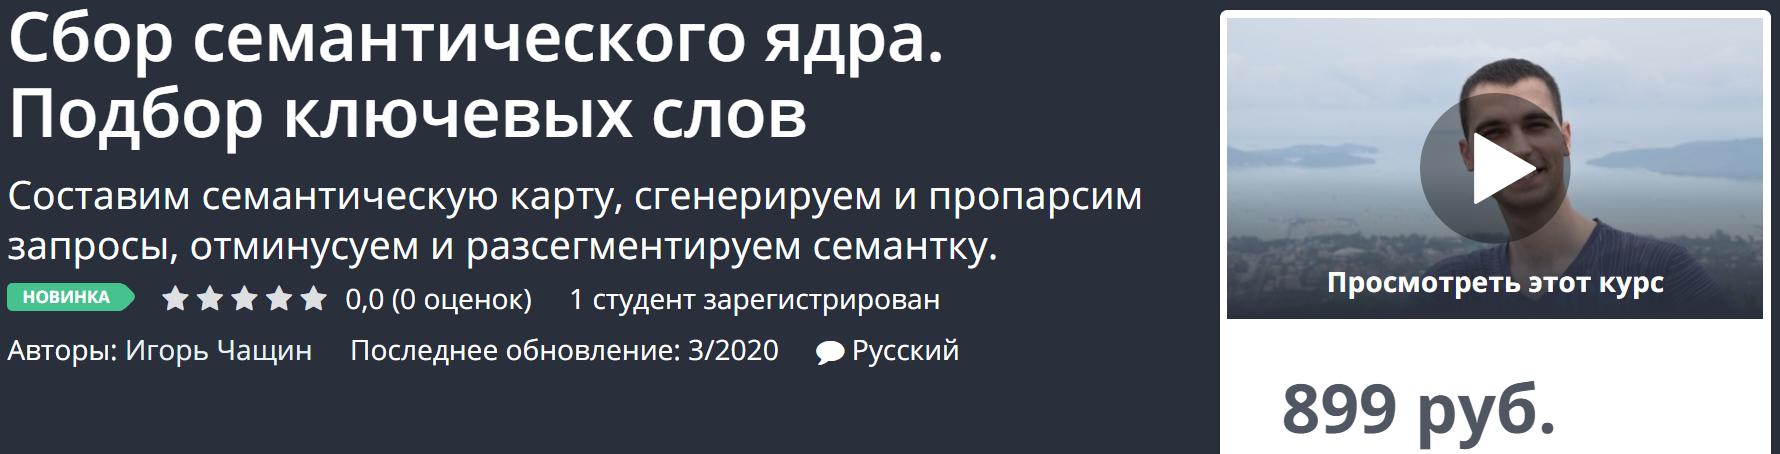 2020-03-25_21-05-10